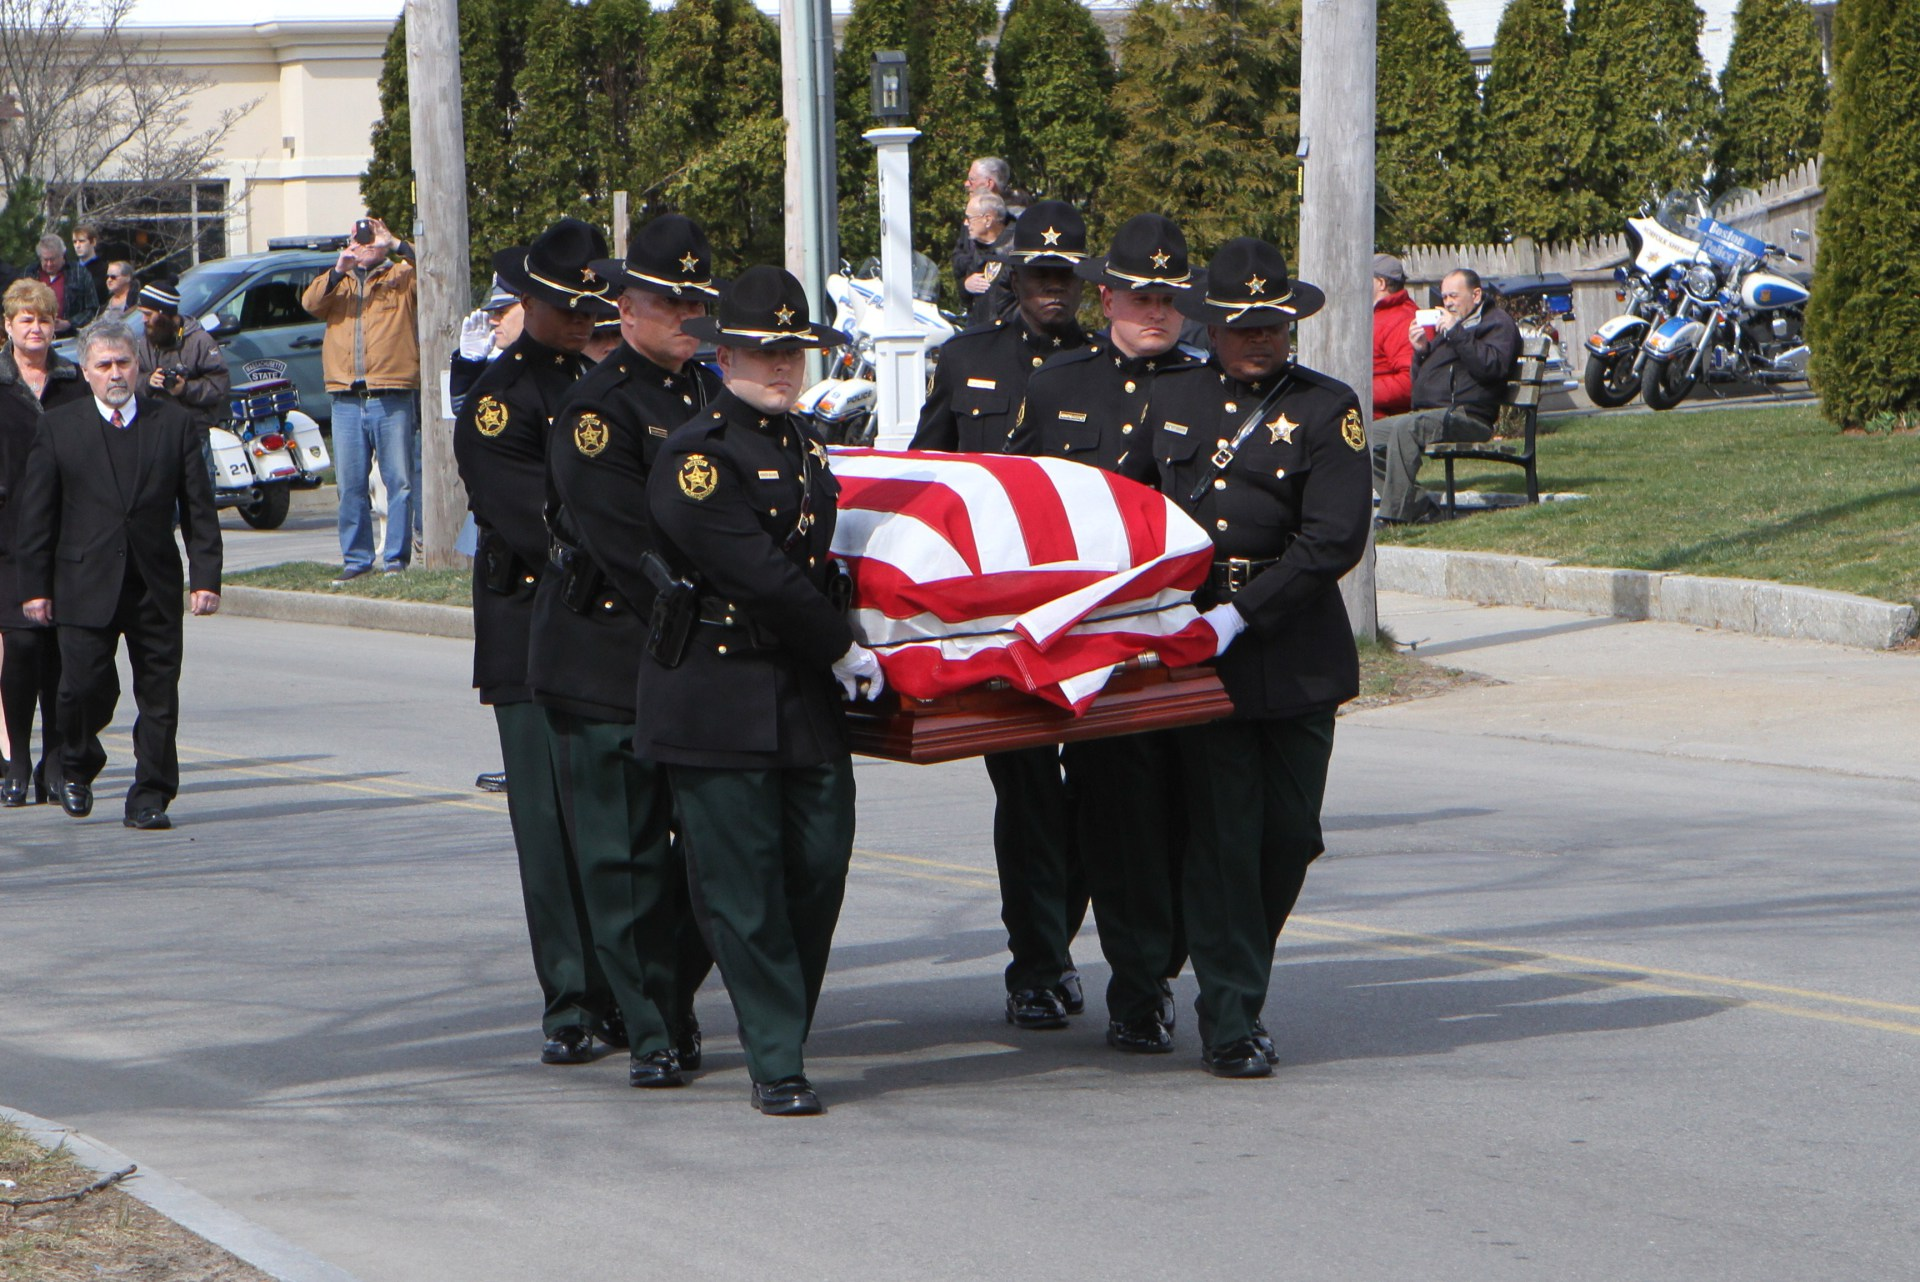 Deputy Sheriff John R. Kotfila, Jr. Funeral - Falmouth, Massachusetts - March 23, 2016